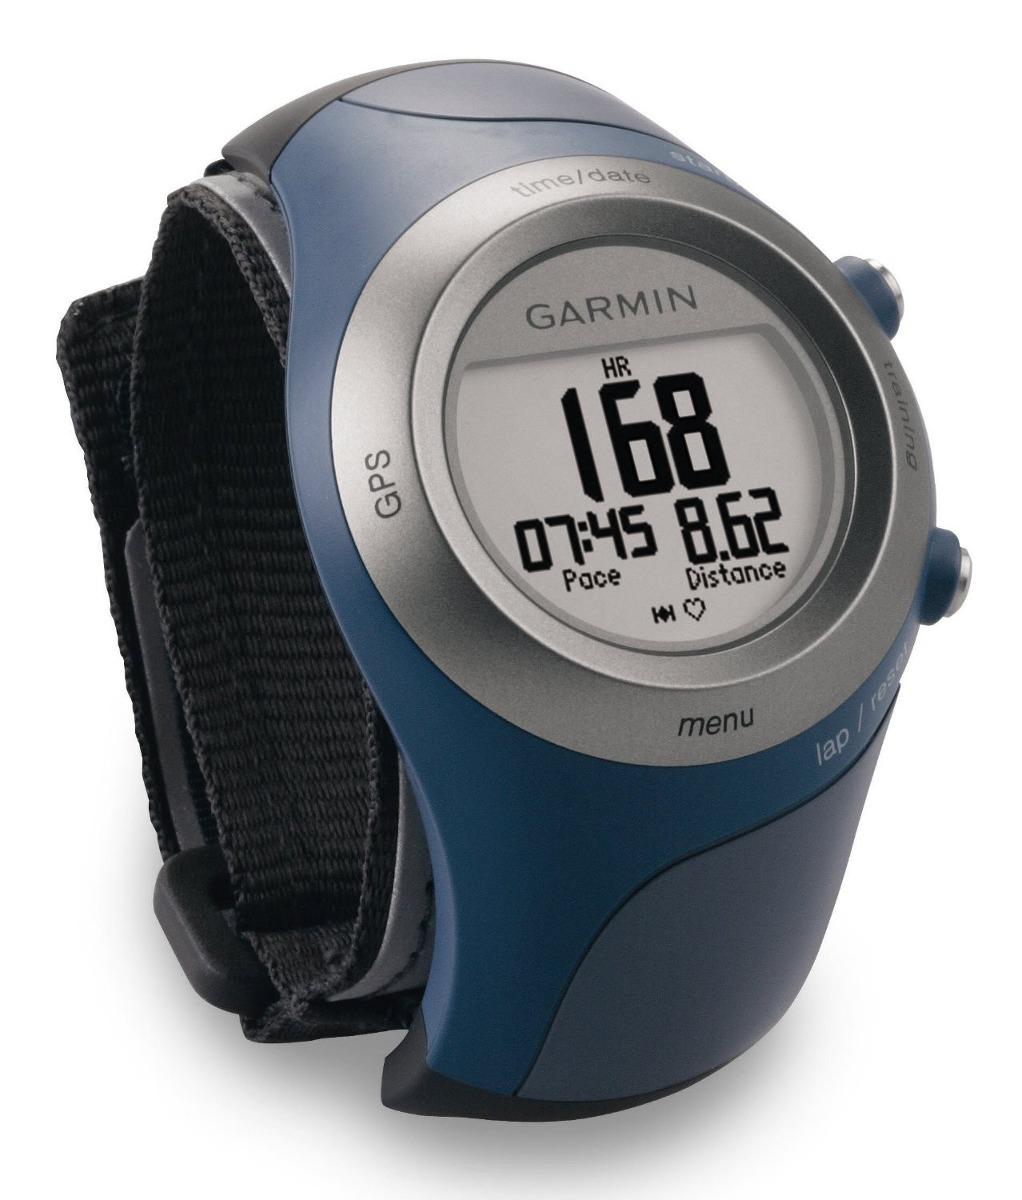 Reloj Garmin Forerunner 405cx Gps Sport Watch With Heart ...